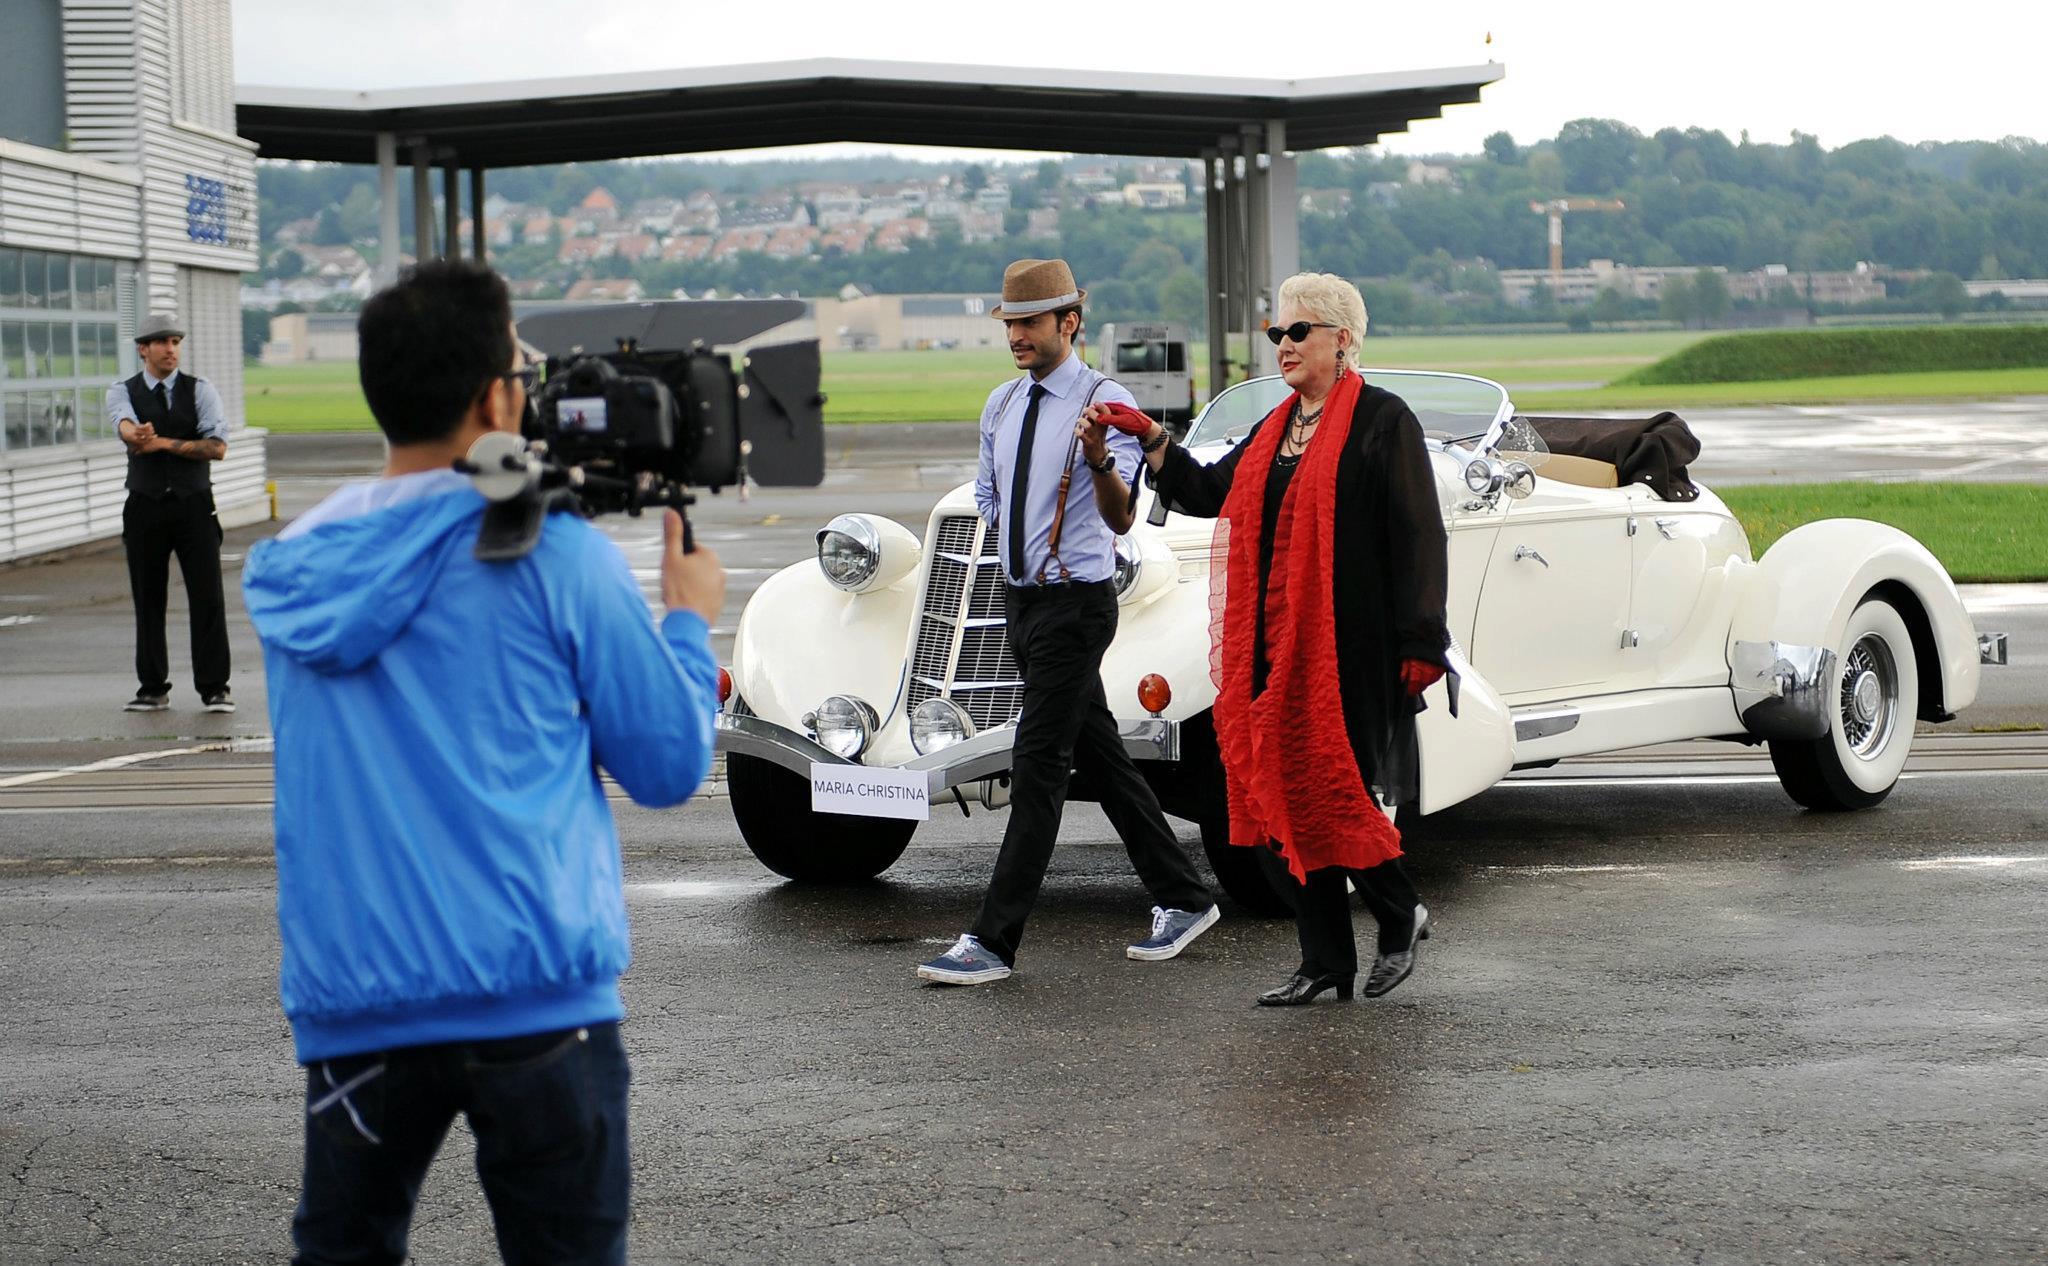 Maria Christina Video Shoot